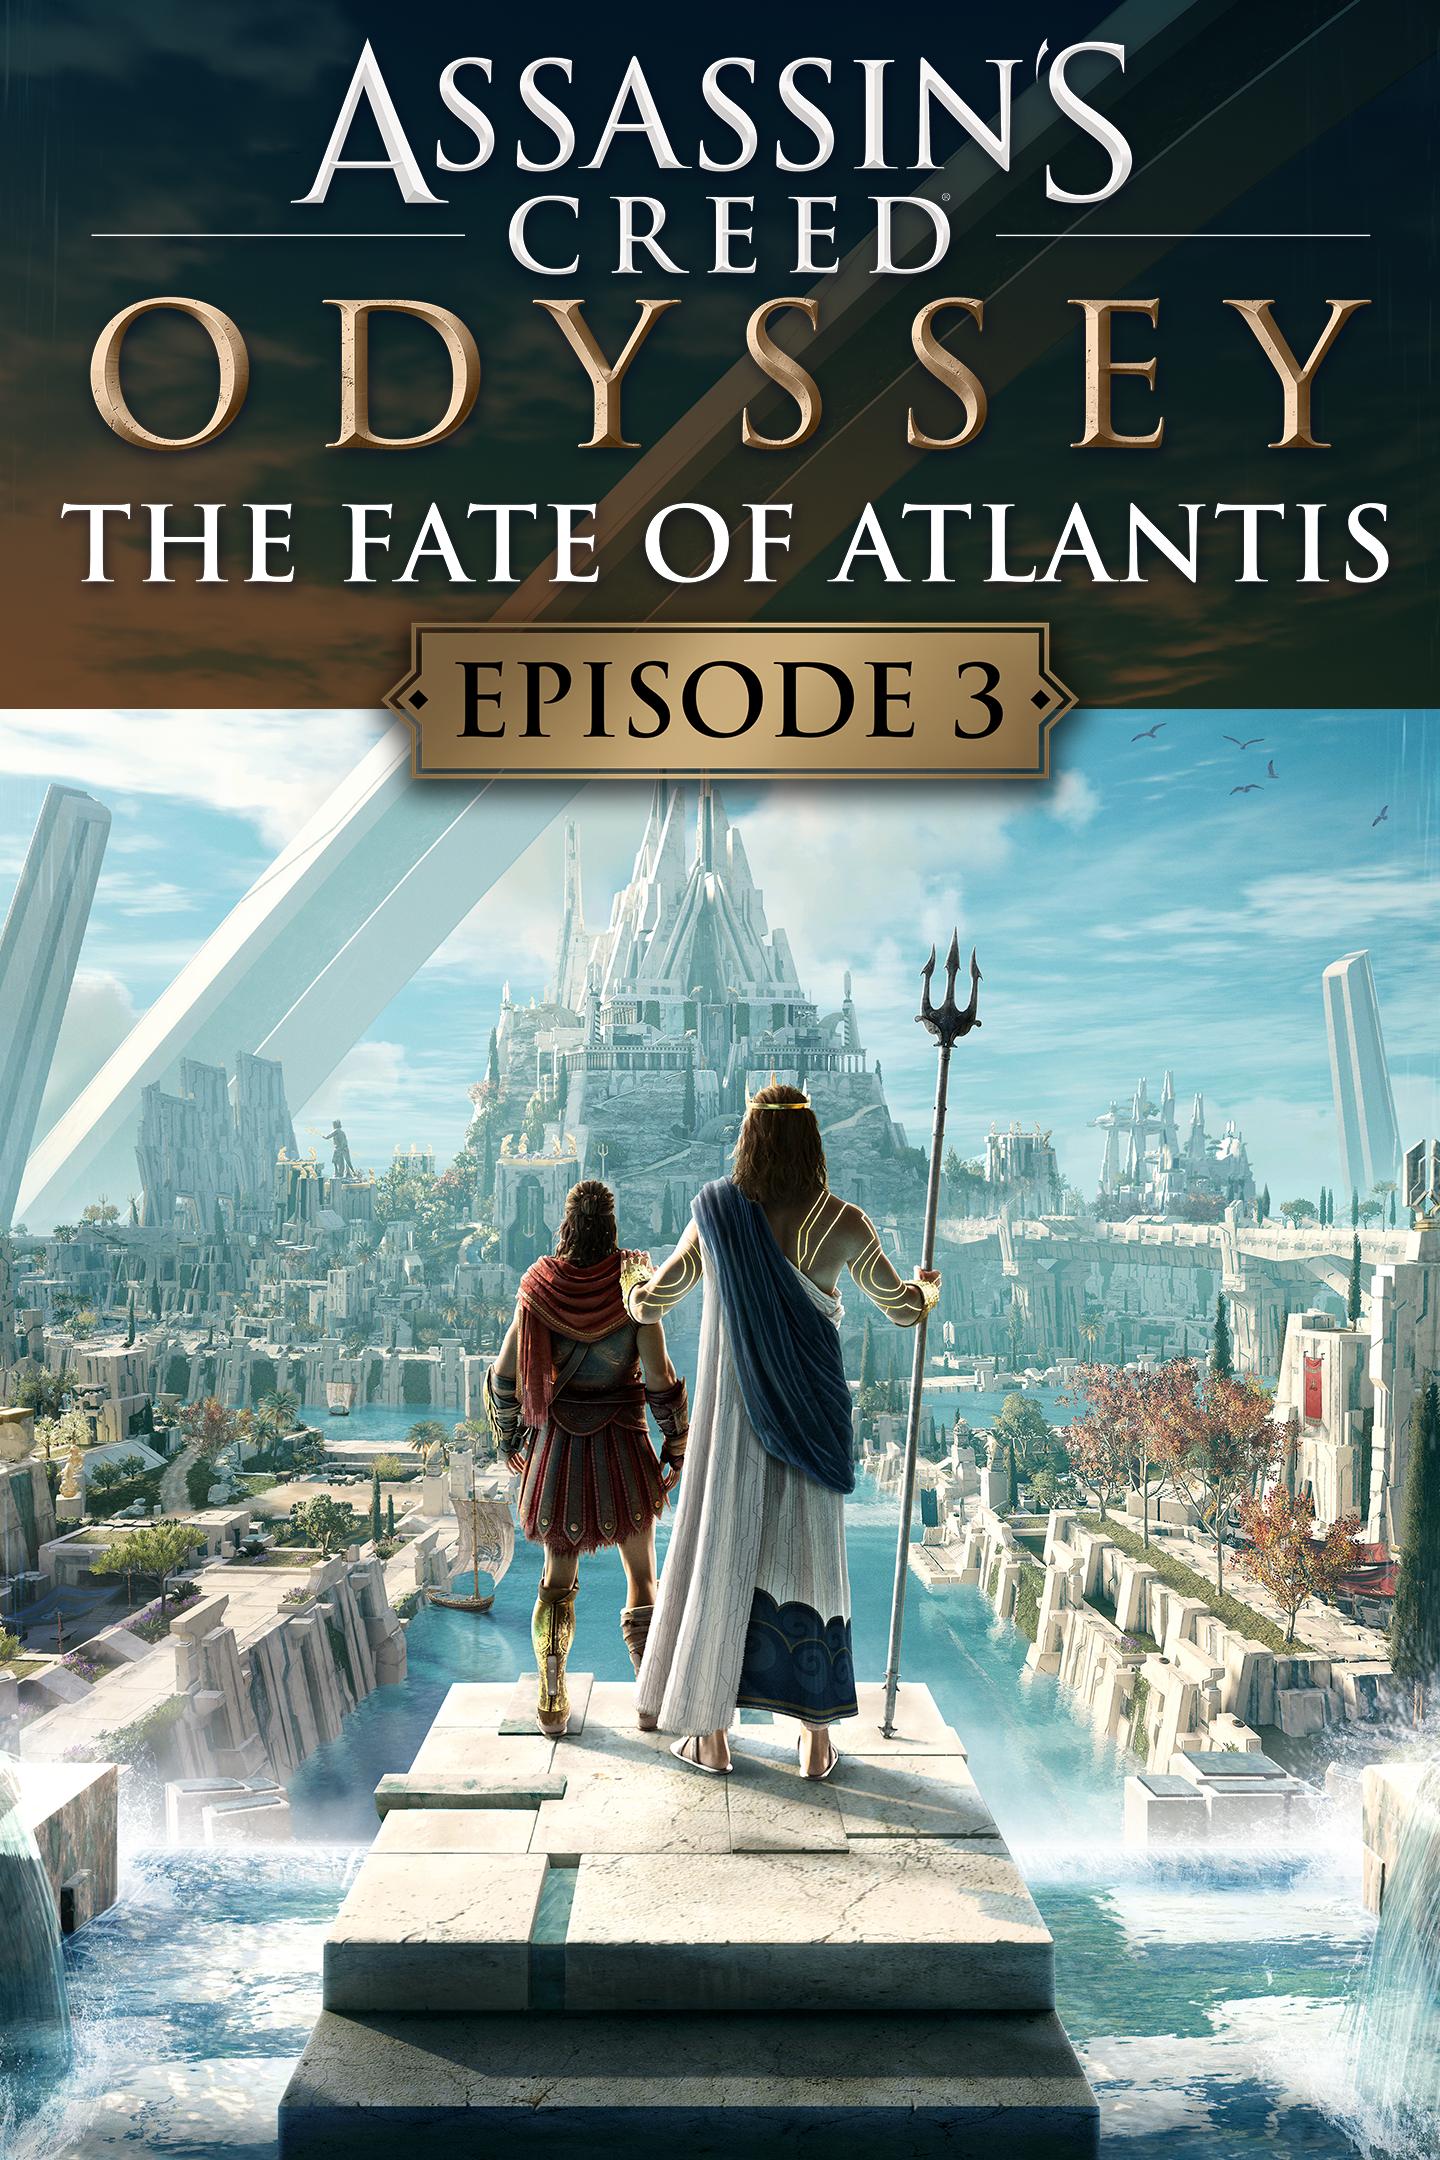 The Fate of Atlantis: Judgment of Atlantis